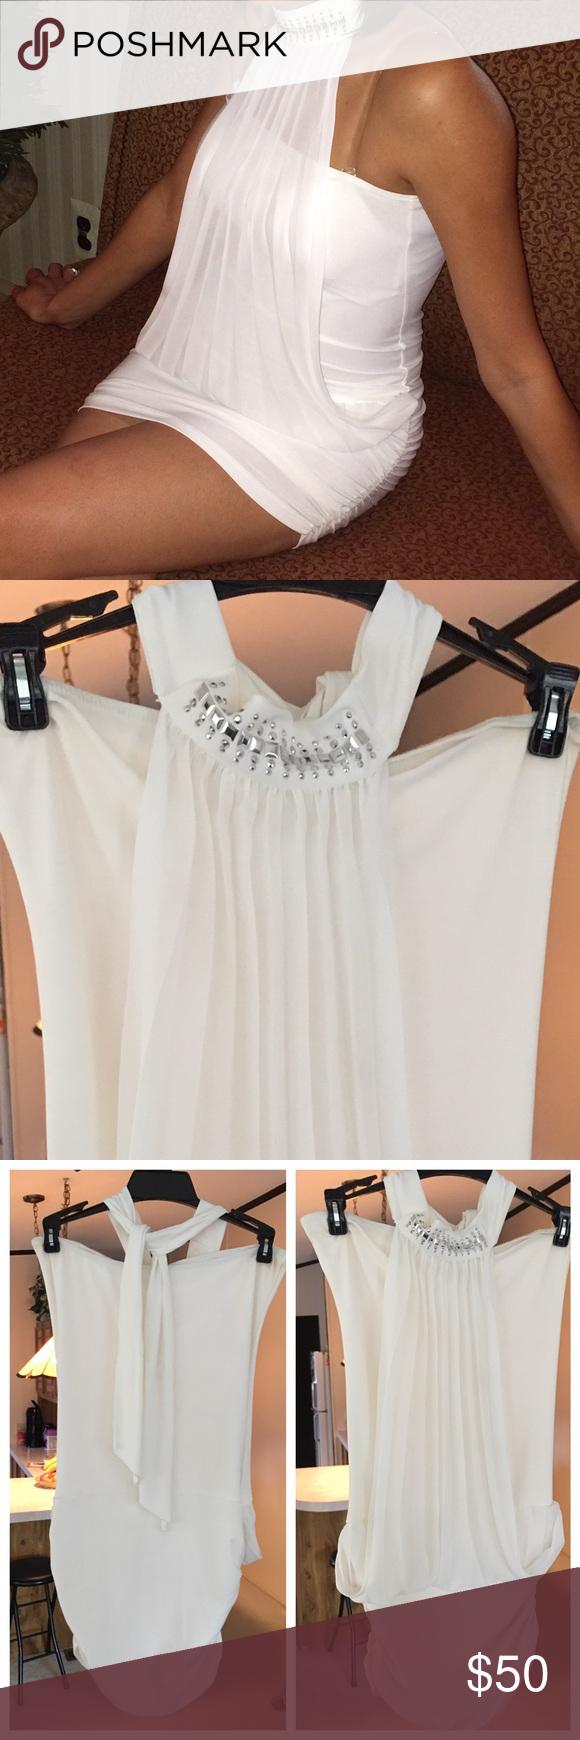 White mini dress Beautiful white halter top mini dress. Collar has silver design. Worn once Dresses Mini